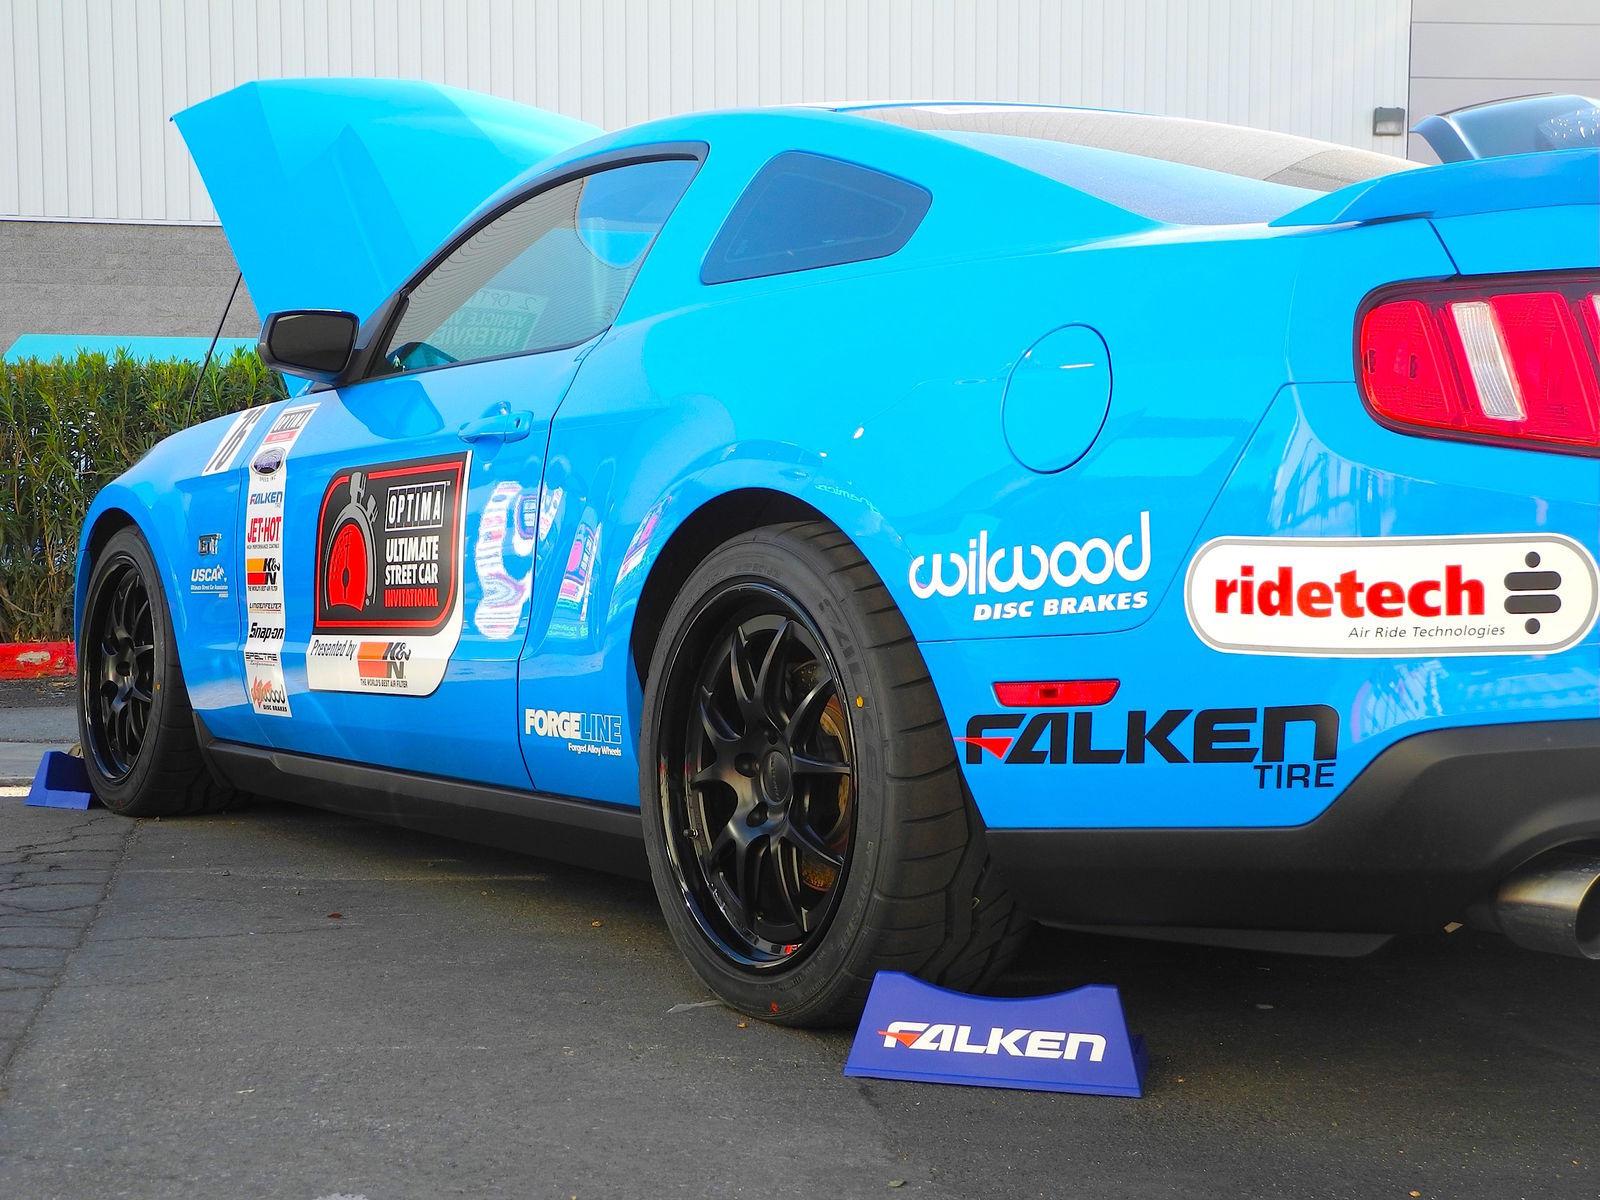 2010 Ford Mustang | Saroja Raman's Grabber Blue S197 Mustang GT on Forgeline GA3 Wheels